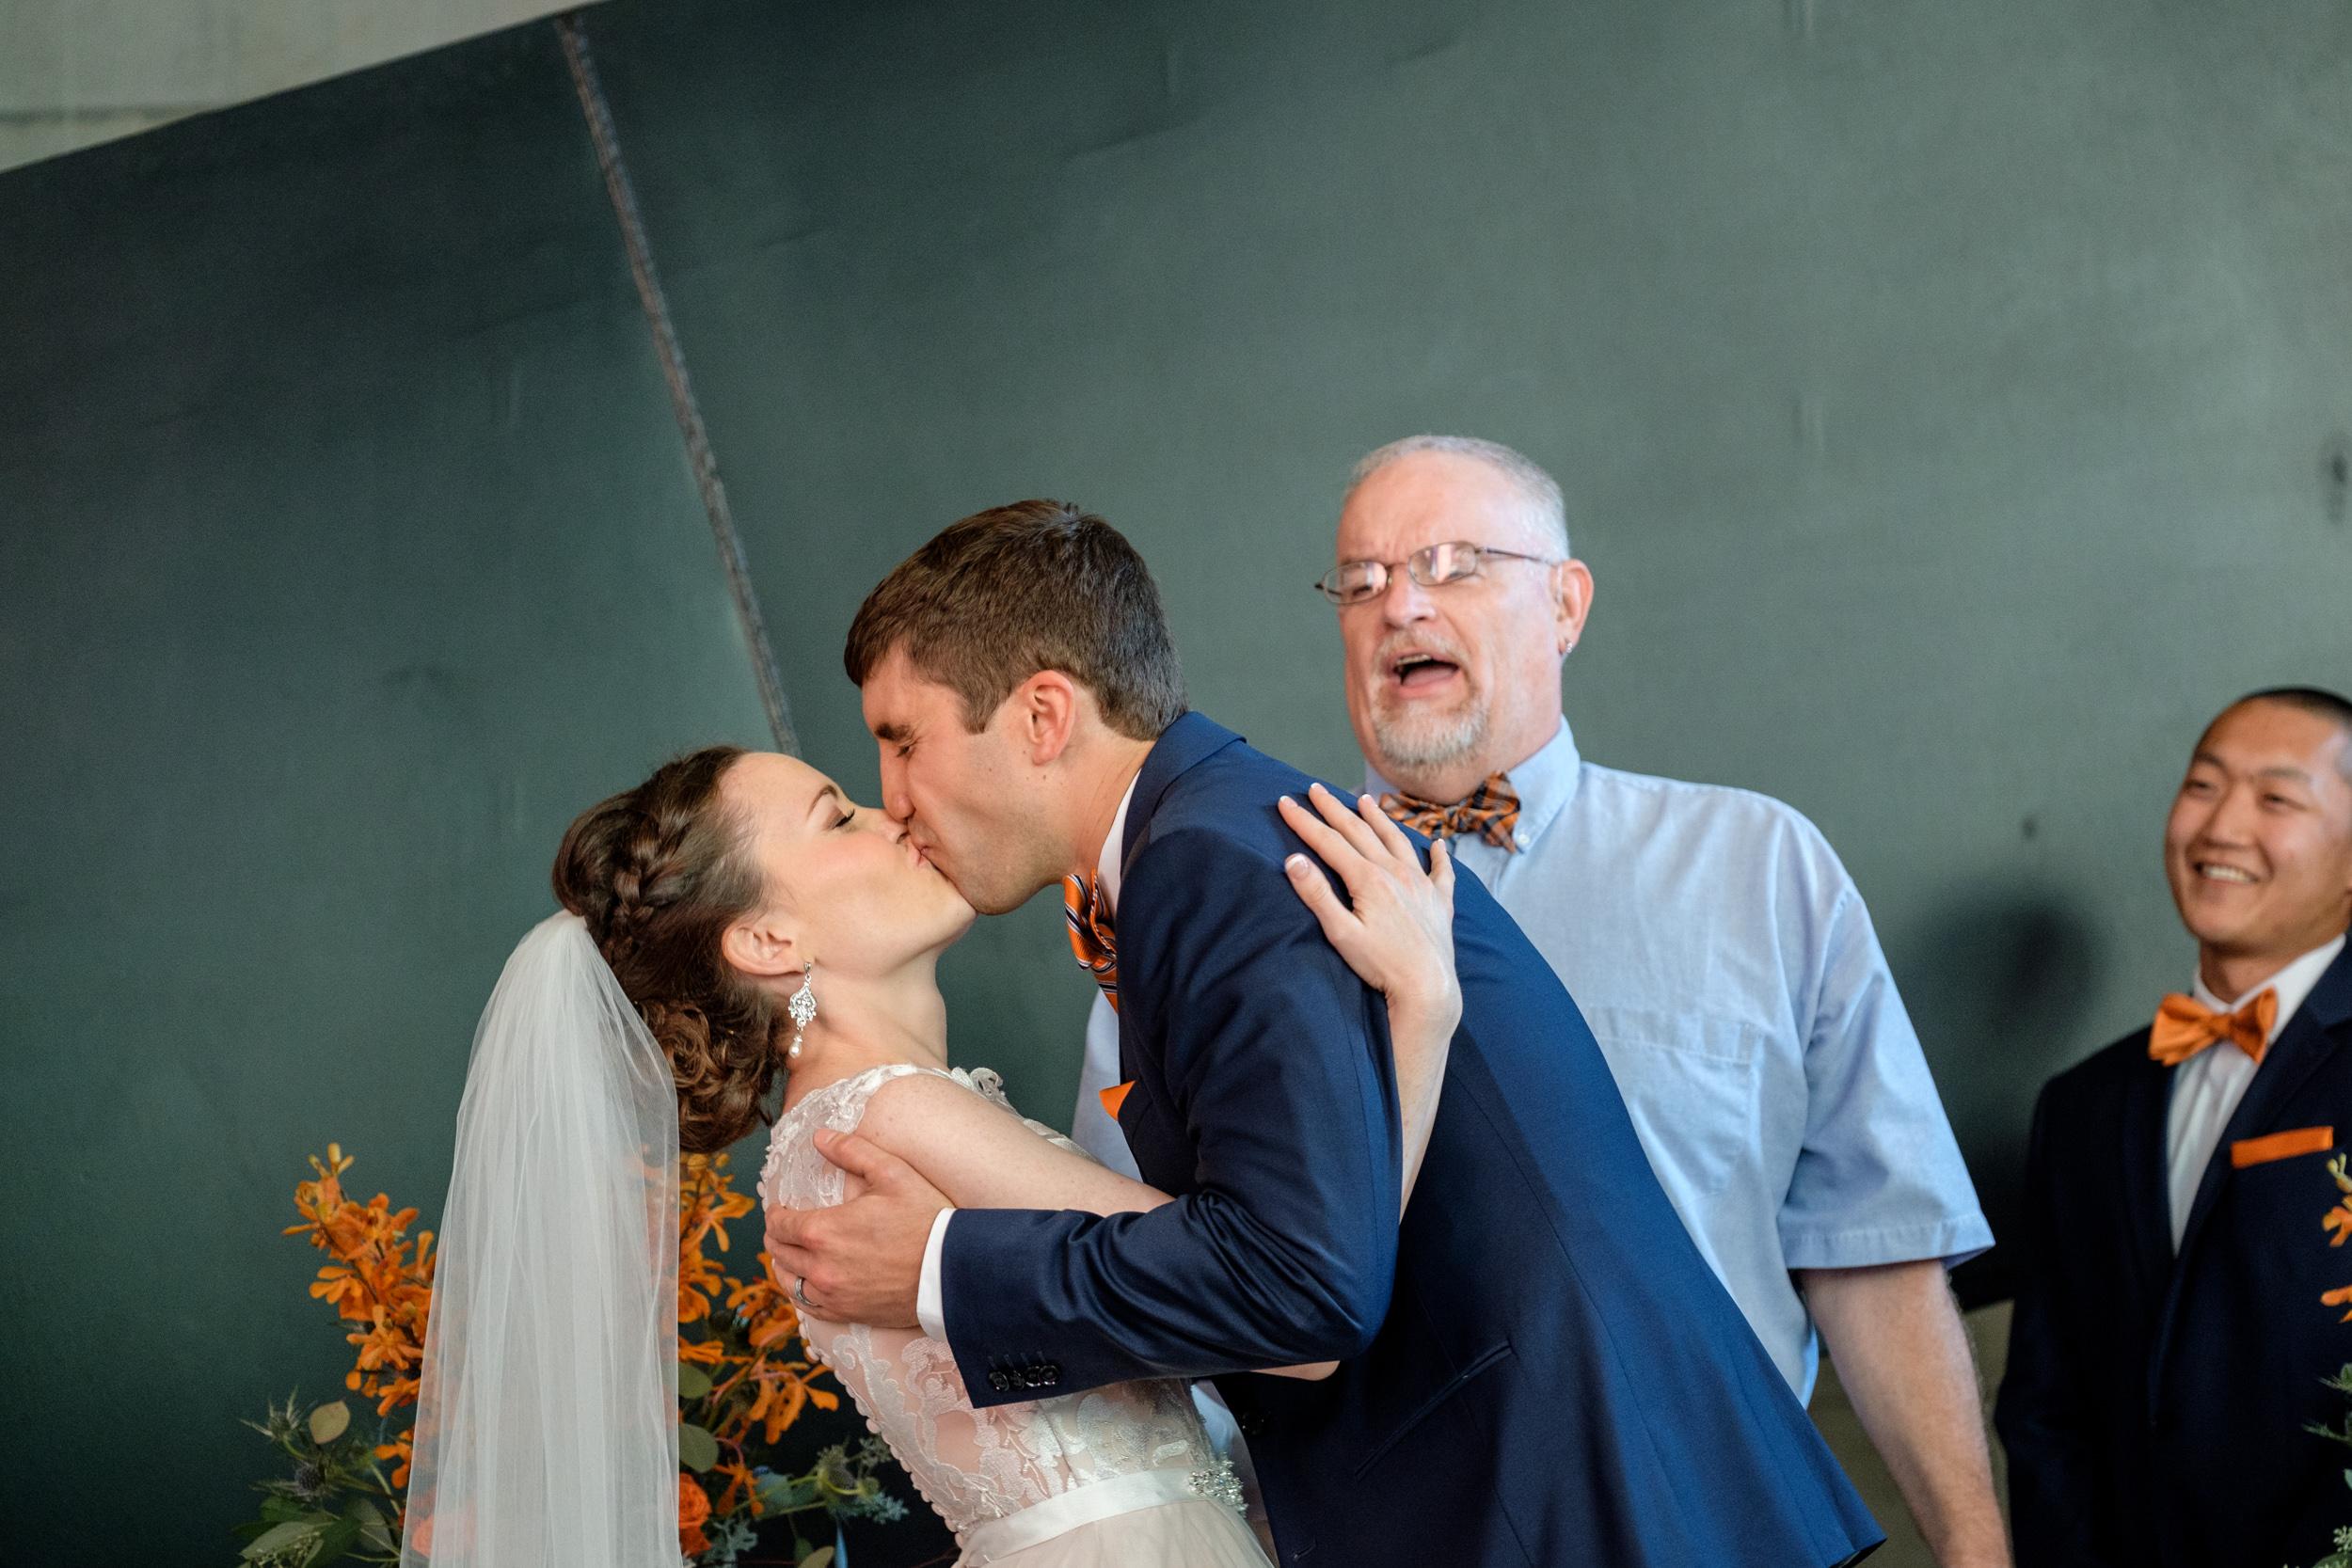 TheSmythCollective-Best-Cincinnati-Wedding-Photographer-004.jpg